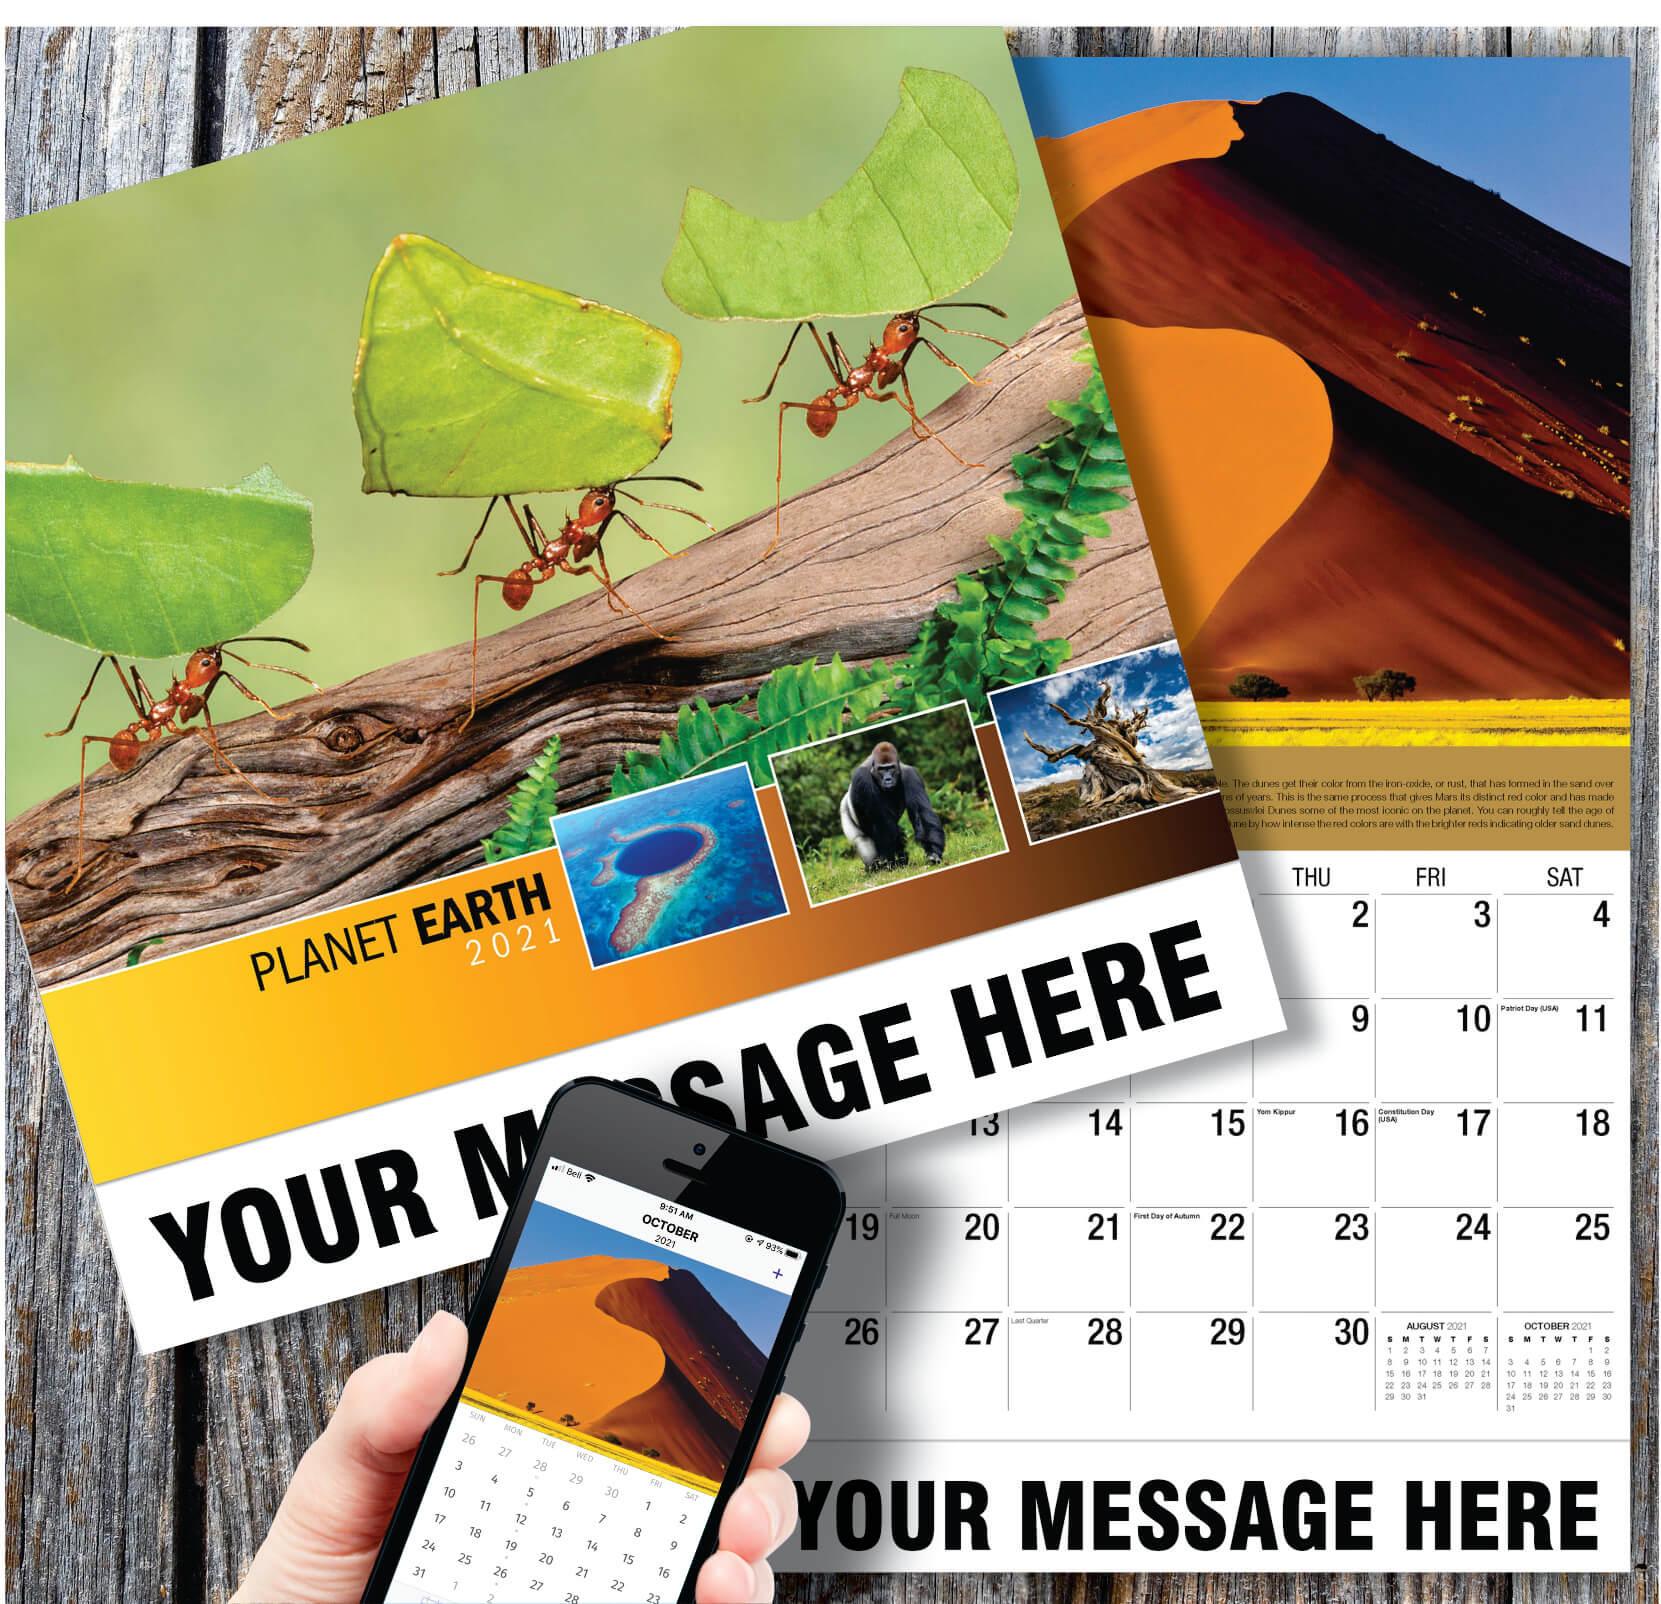 2021 Planet Earth Advertising Calendar   Business ...